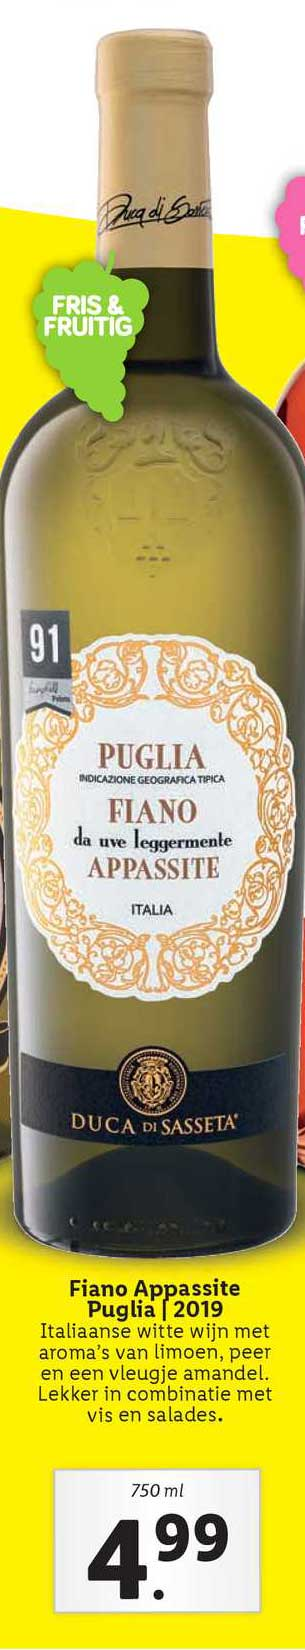 Lidl Fiano Appassite Puglia | 2019